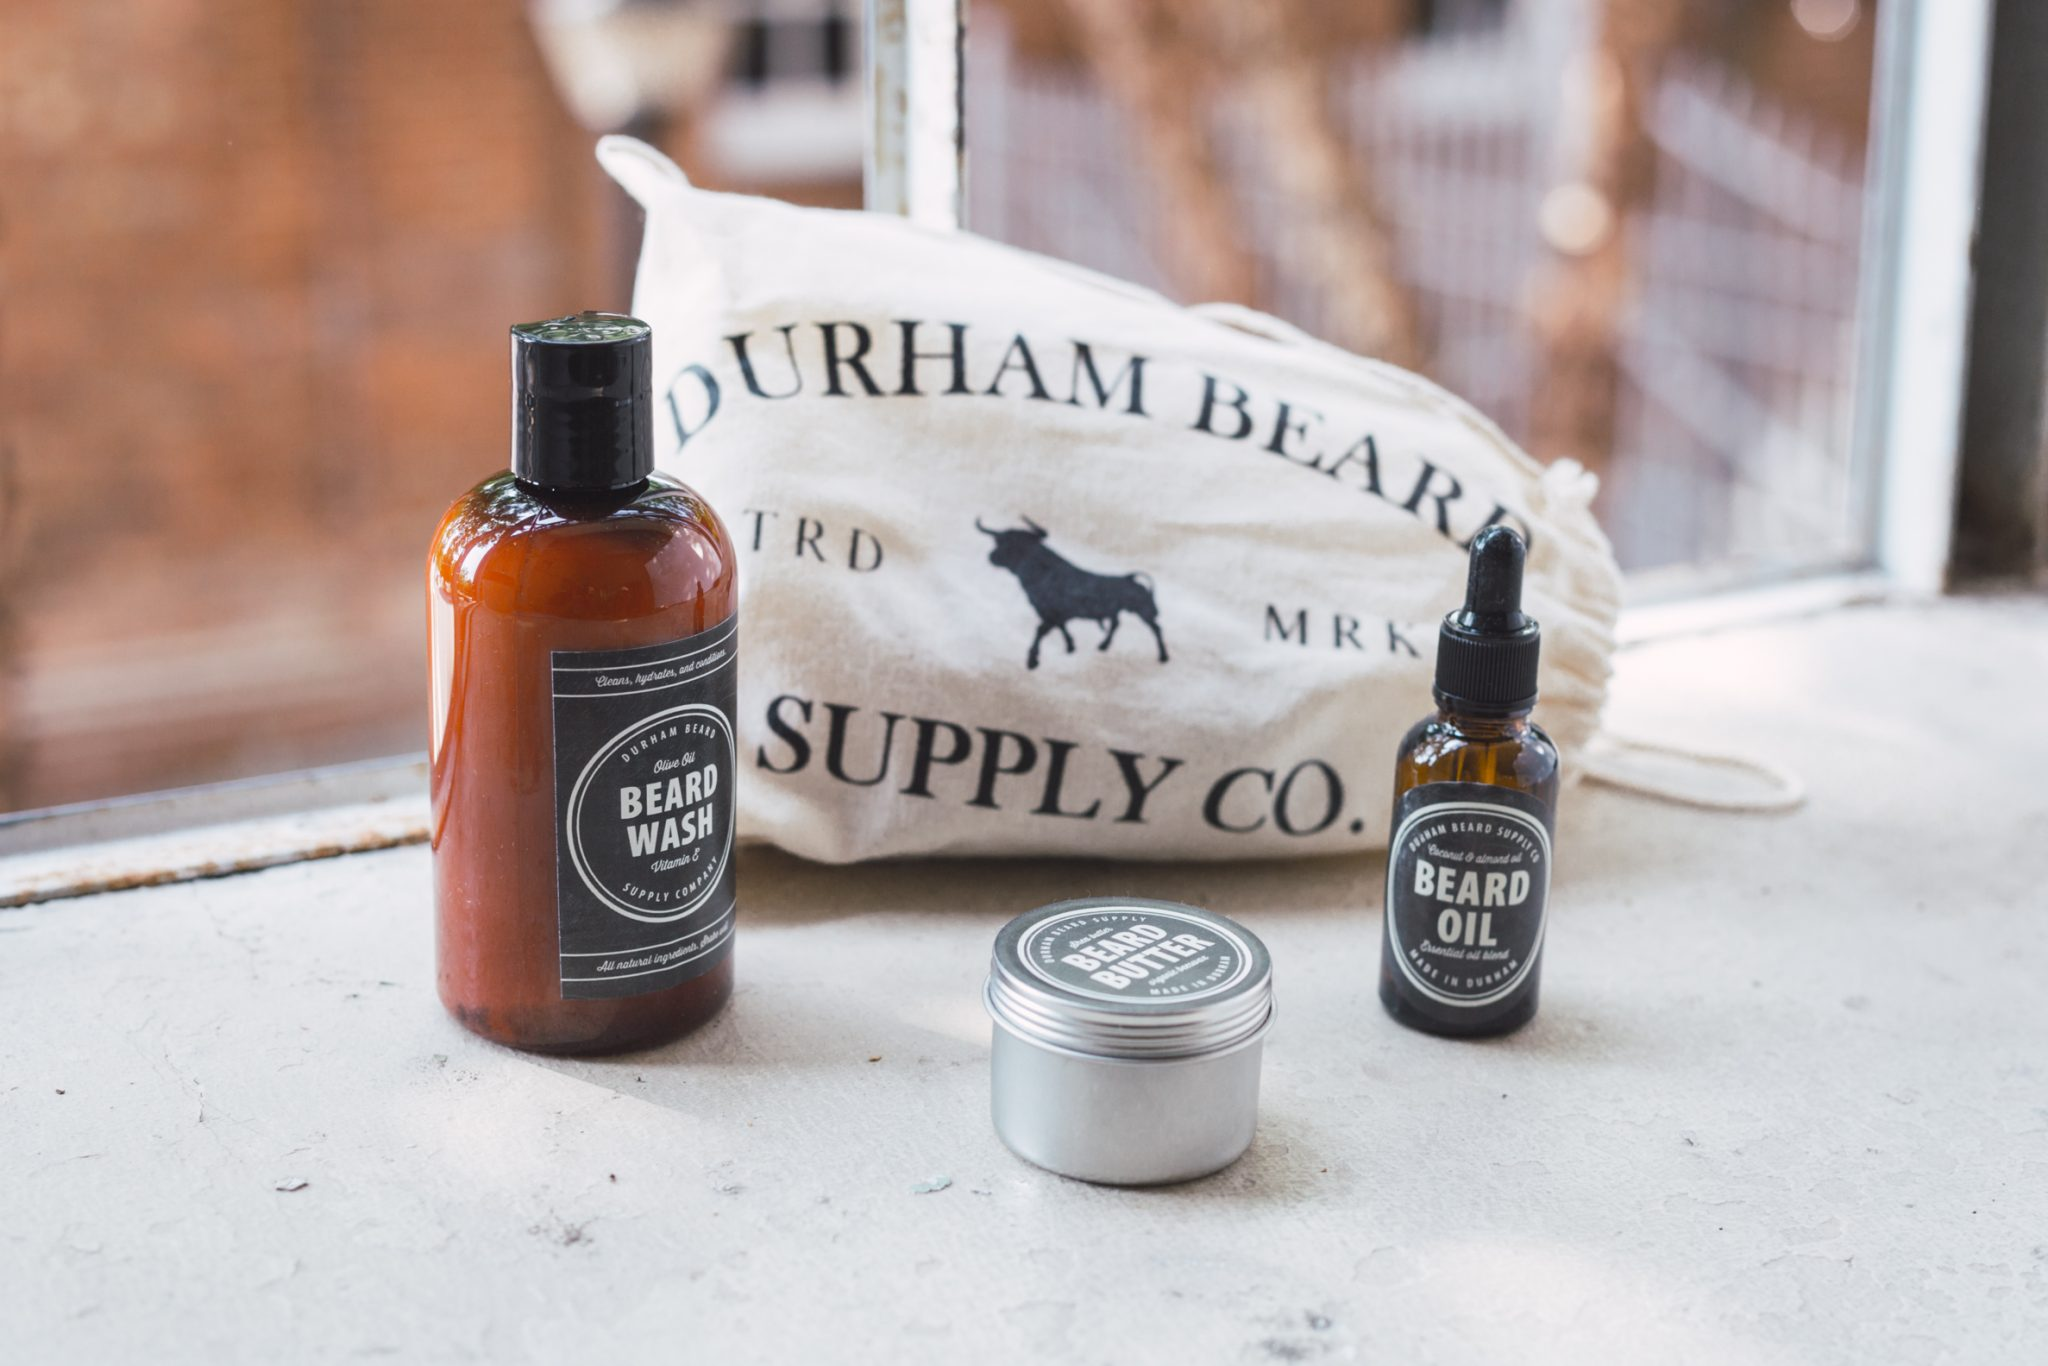 Durham Beard Supply Company